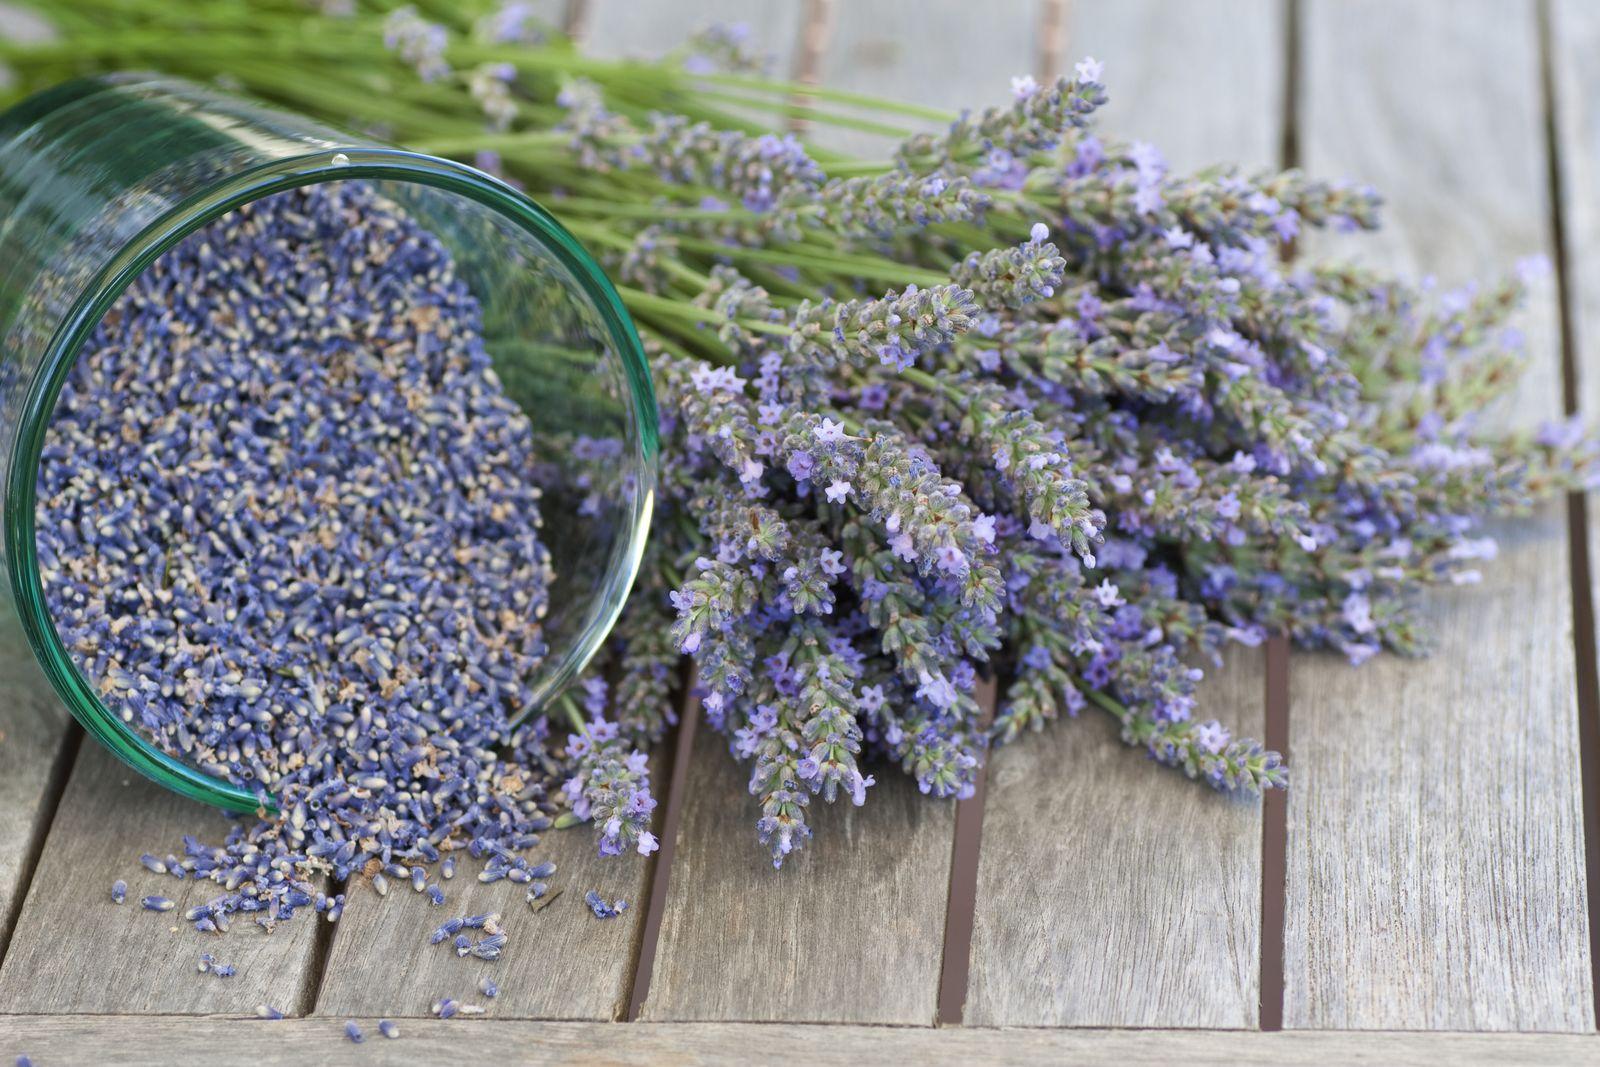 d7e86312ca9ec8 Der Lavendelanbau über Samen braucht Zeit  Foto  Gudrun Muenz   Shutterstock.com